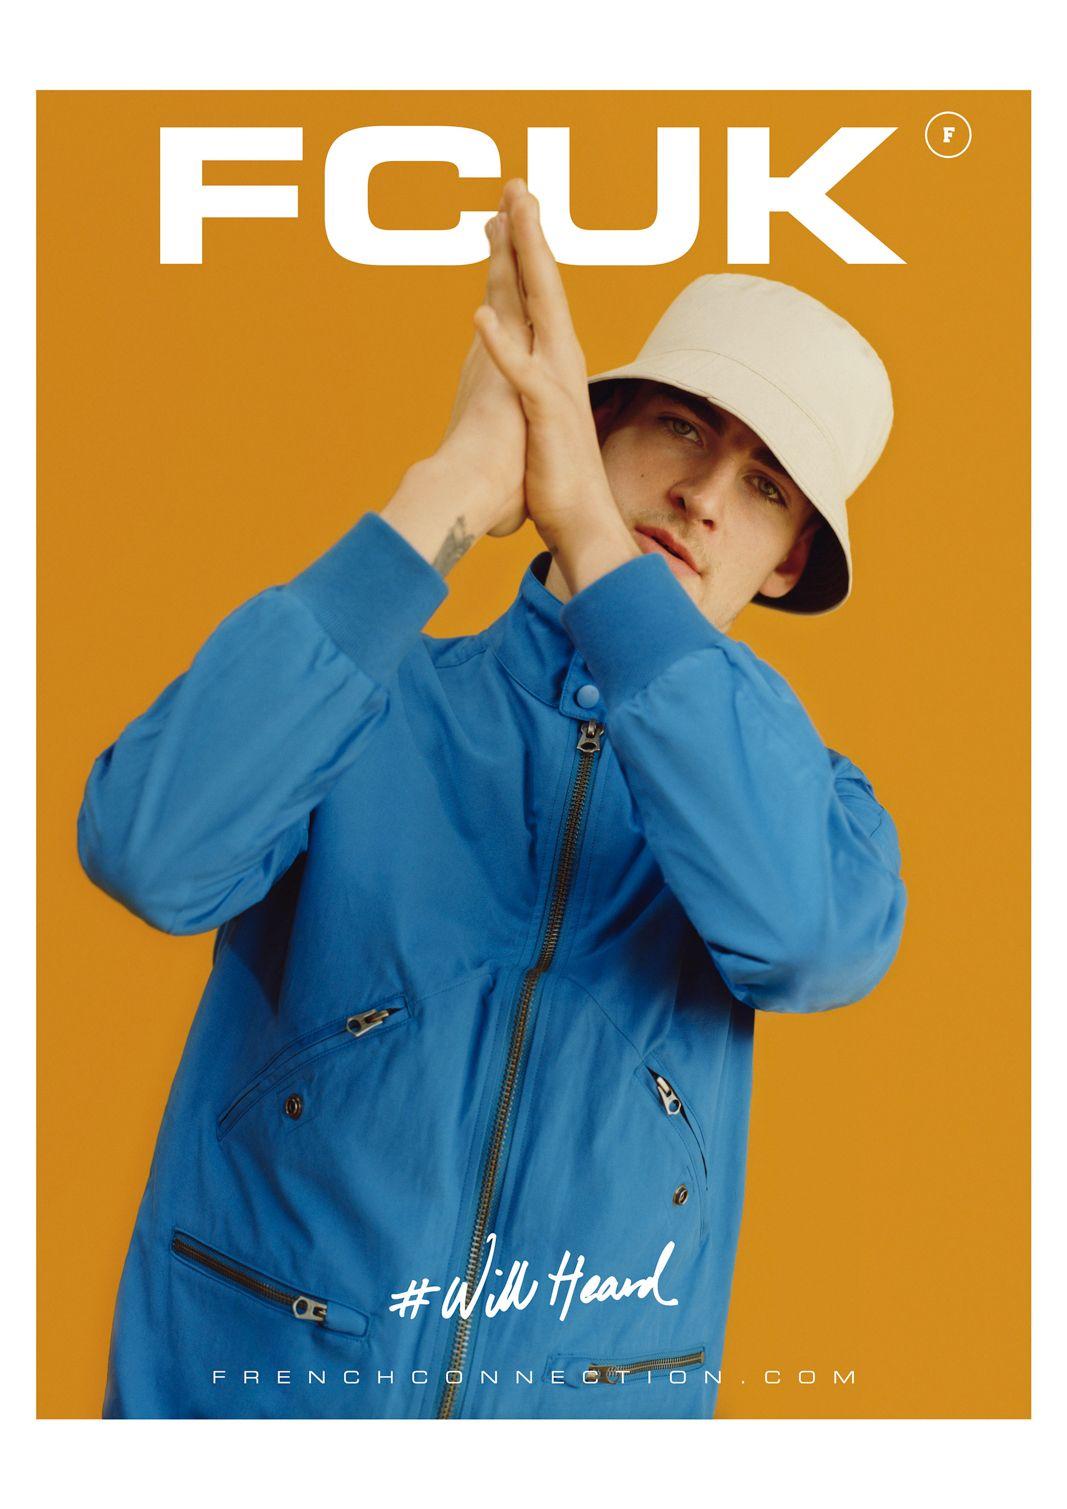 FCUK returns